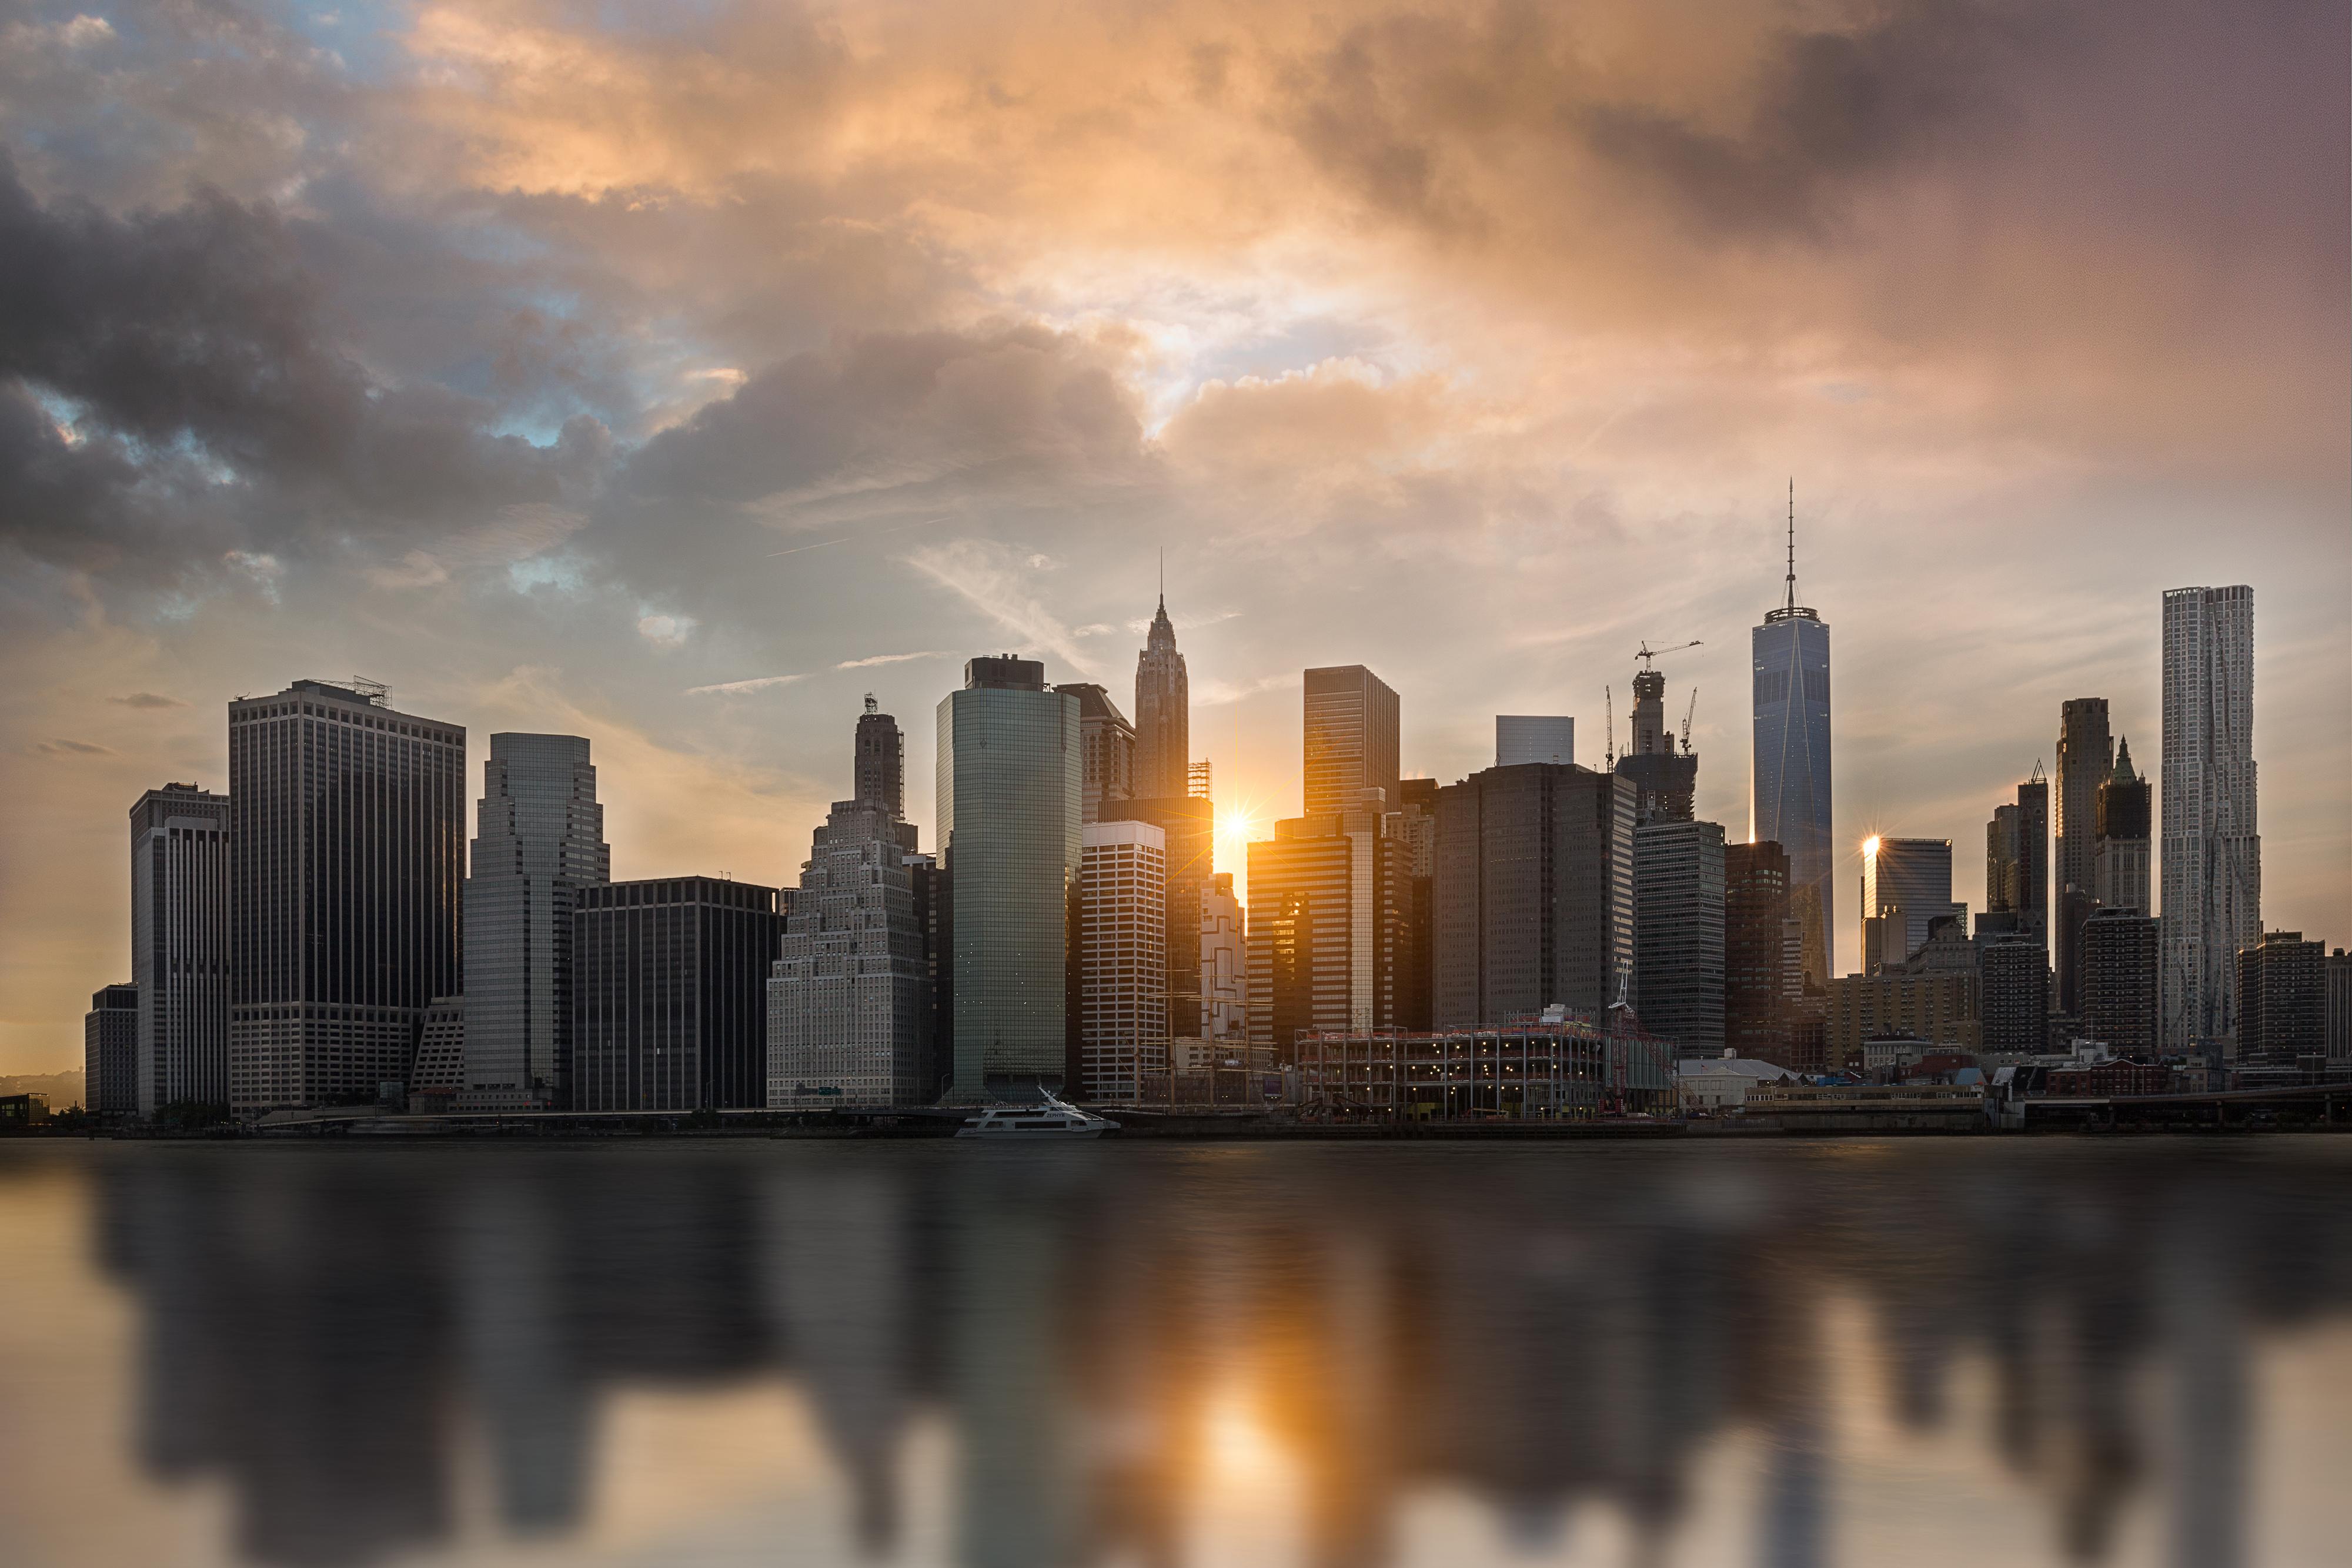 laurent caputo - New York City